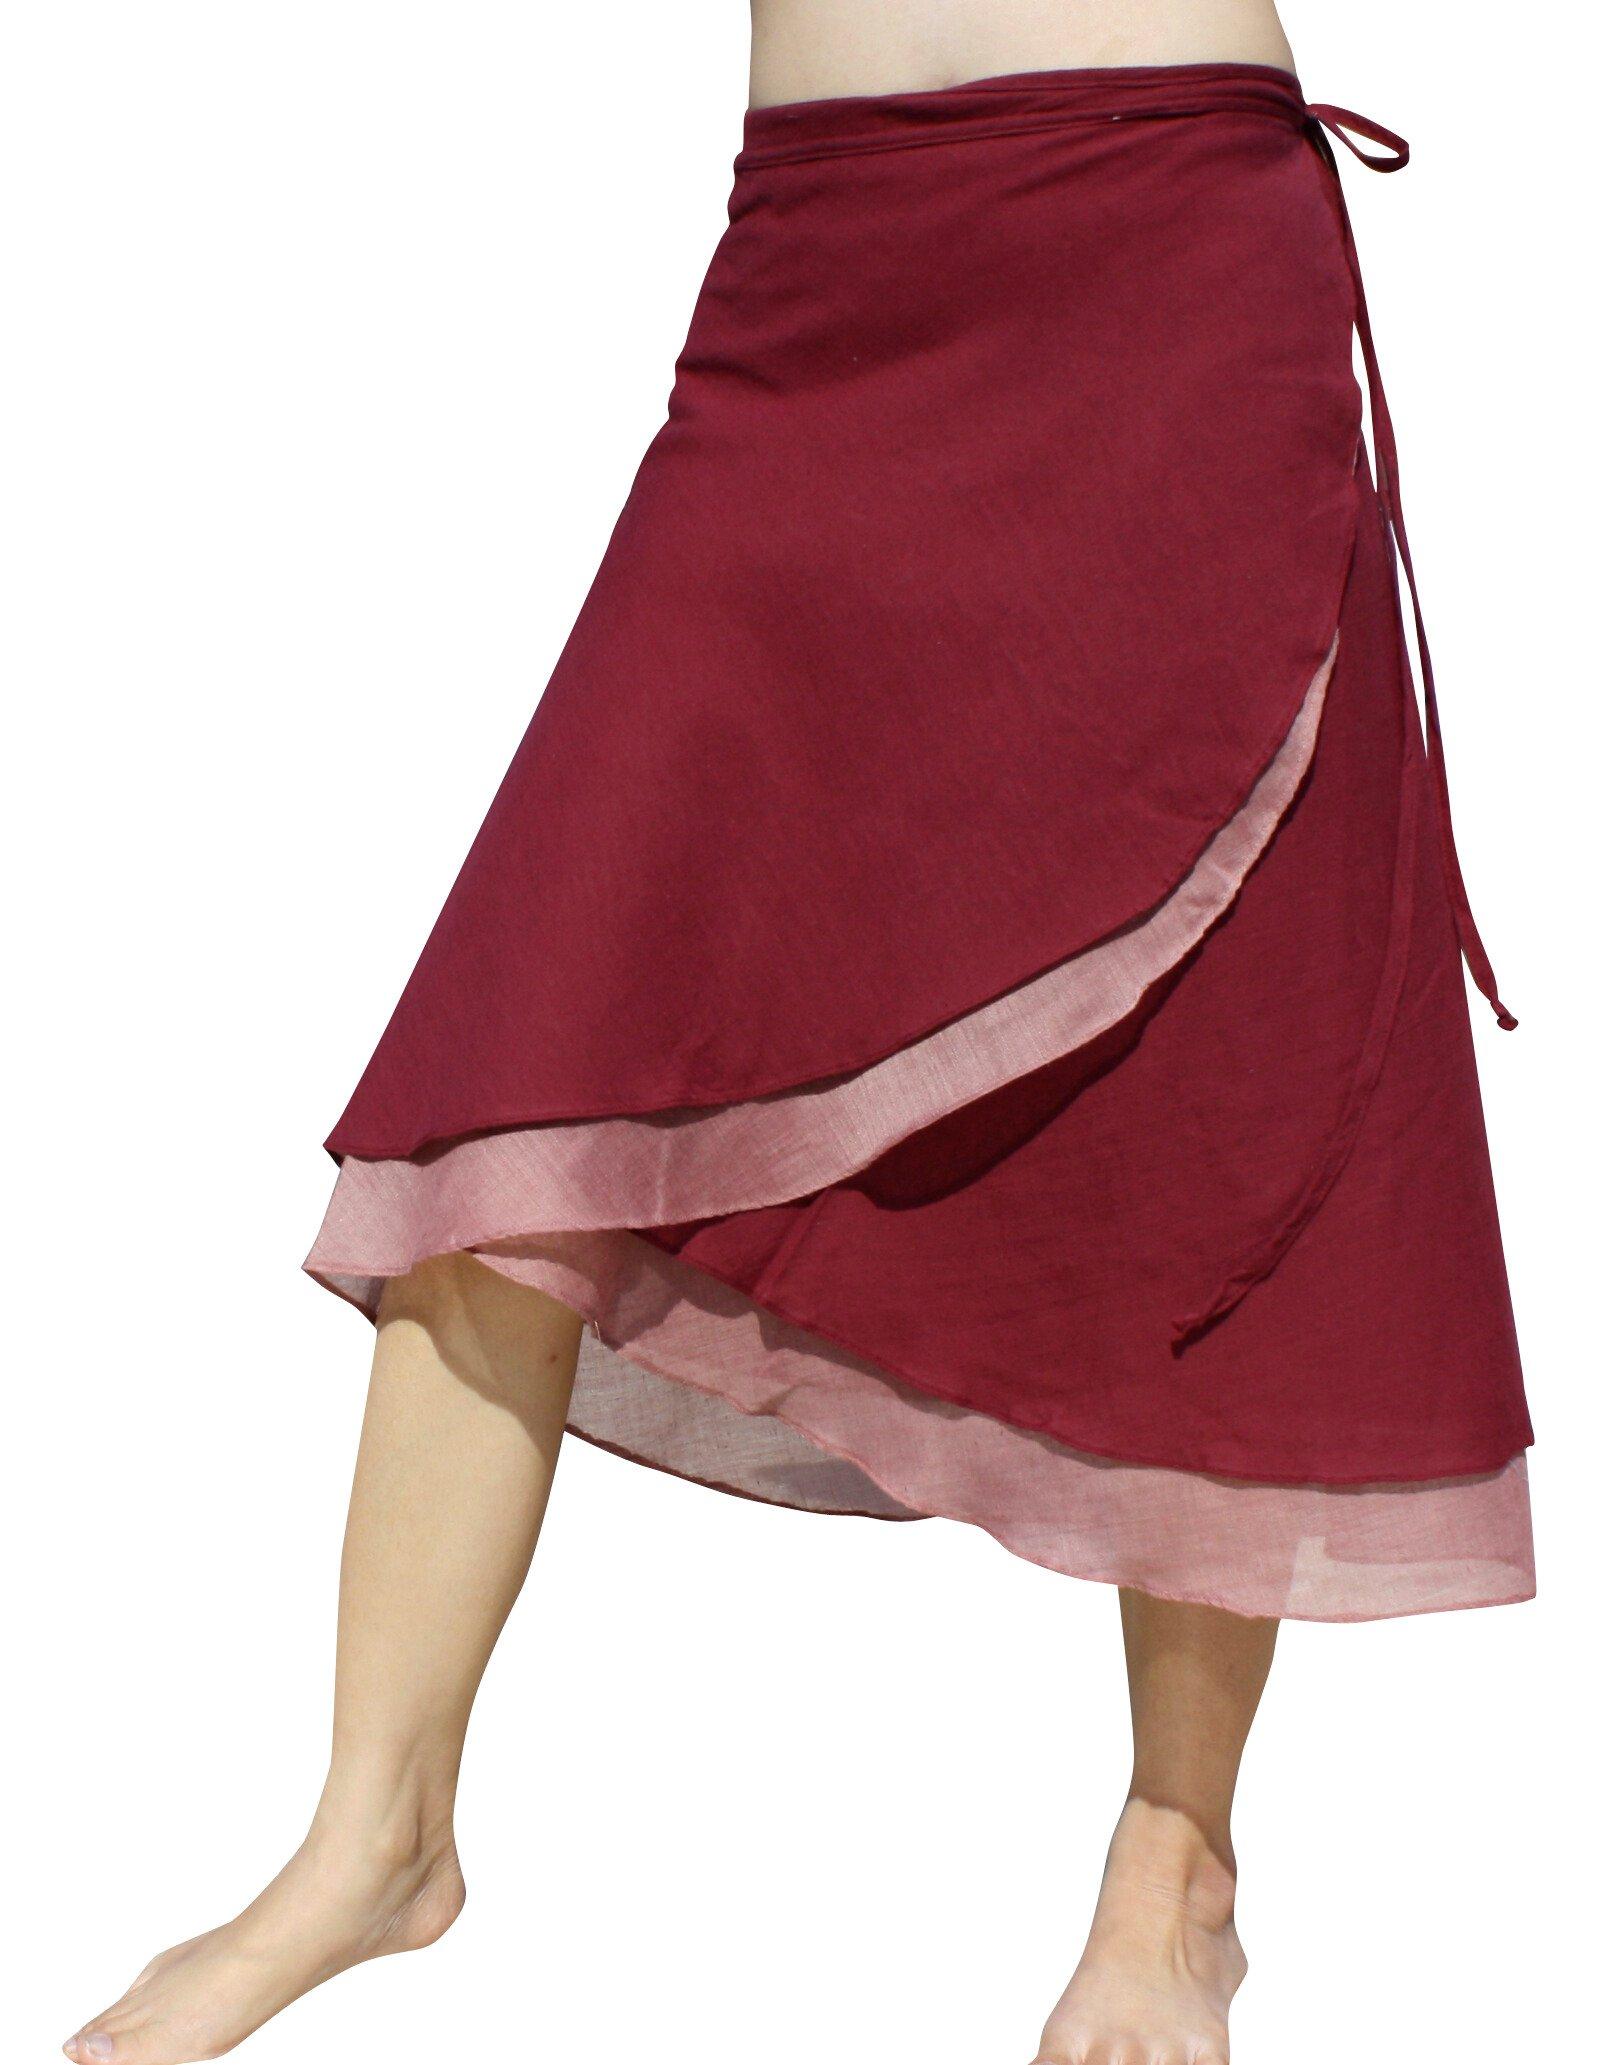 Raan Pah Muang RaanPahMuang Brand Light Cotton Two Layered Carved Cut Summer Wrap Skirt, Medium, Tyrian Red